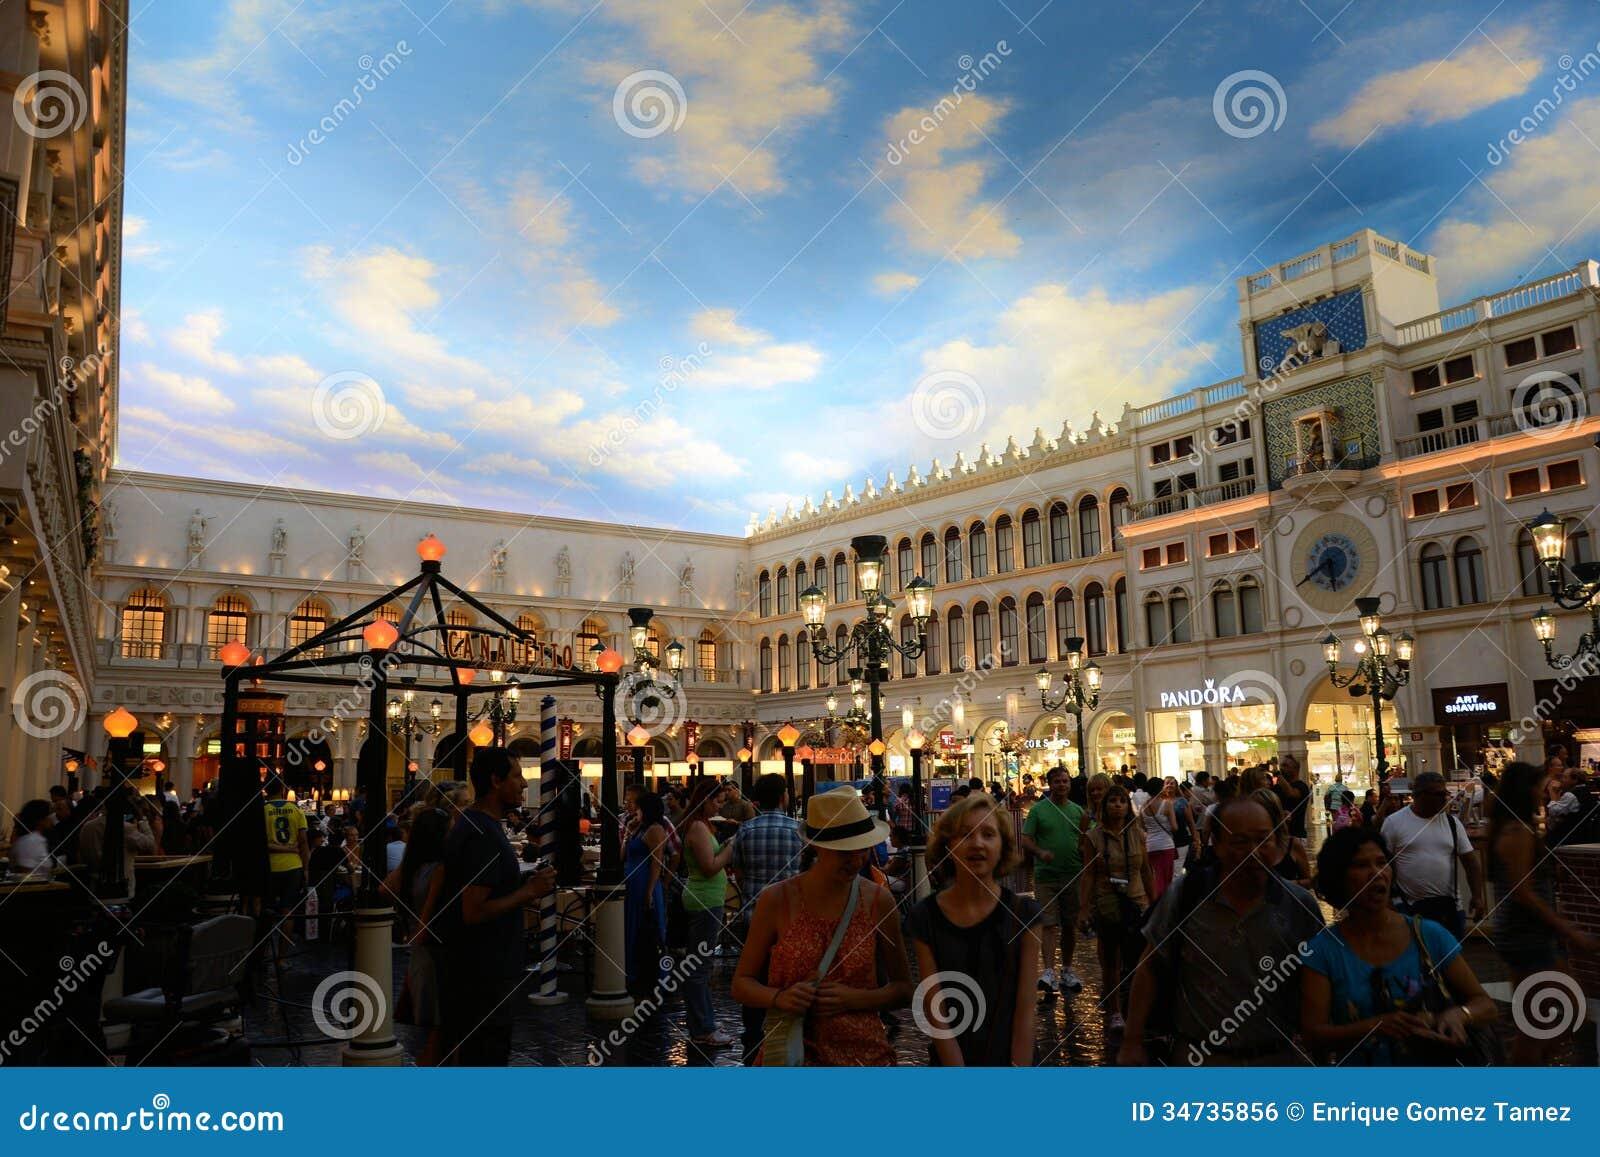 Grand Canal Shoppes at Venetian Hotel Las Vegas